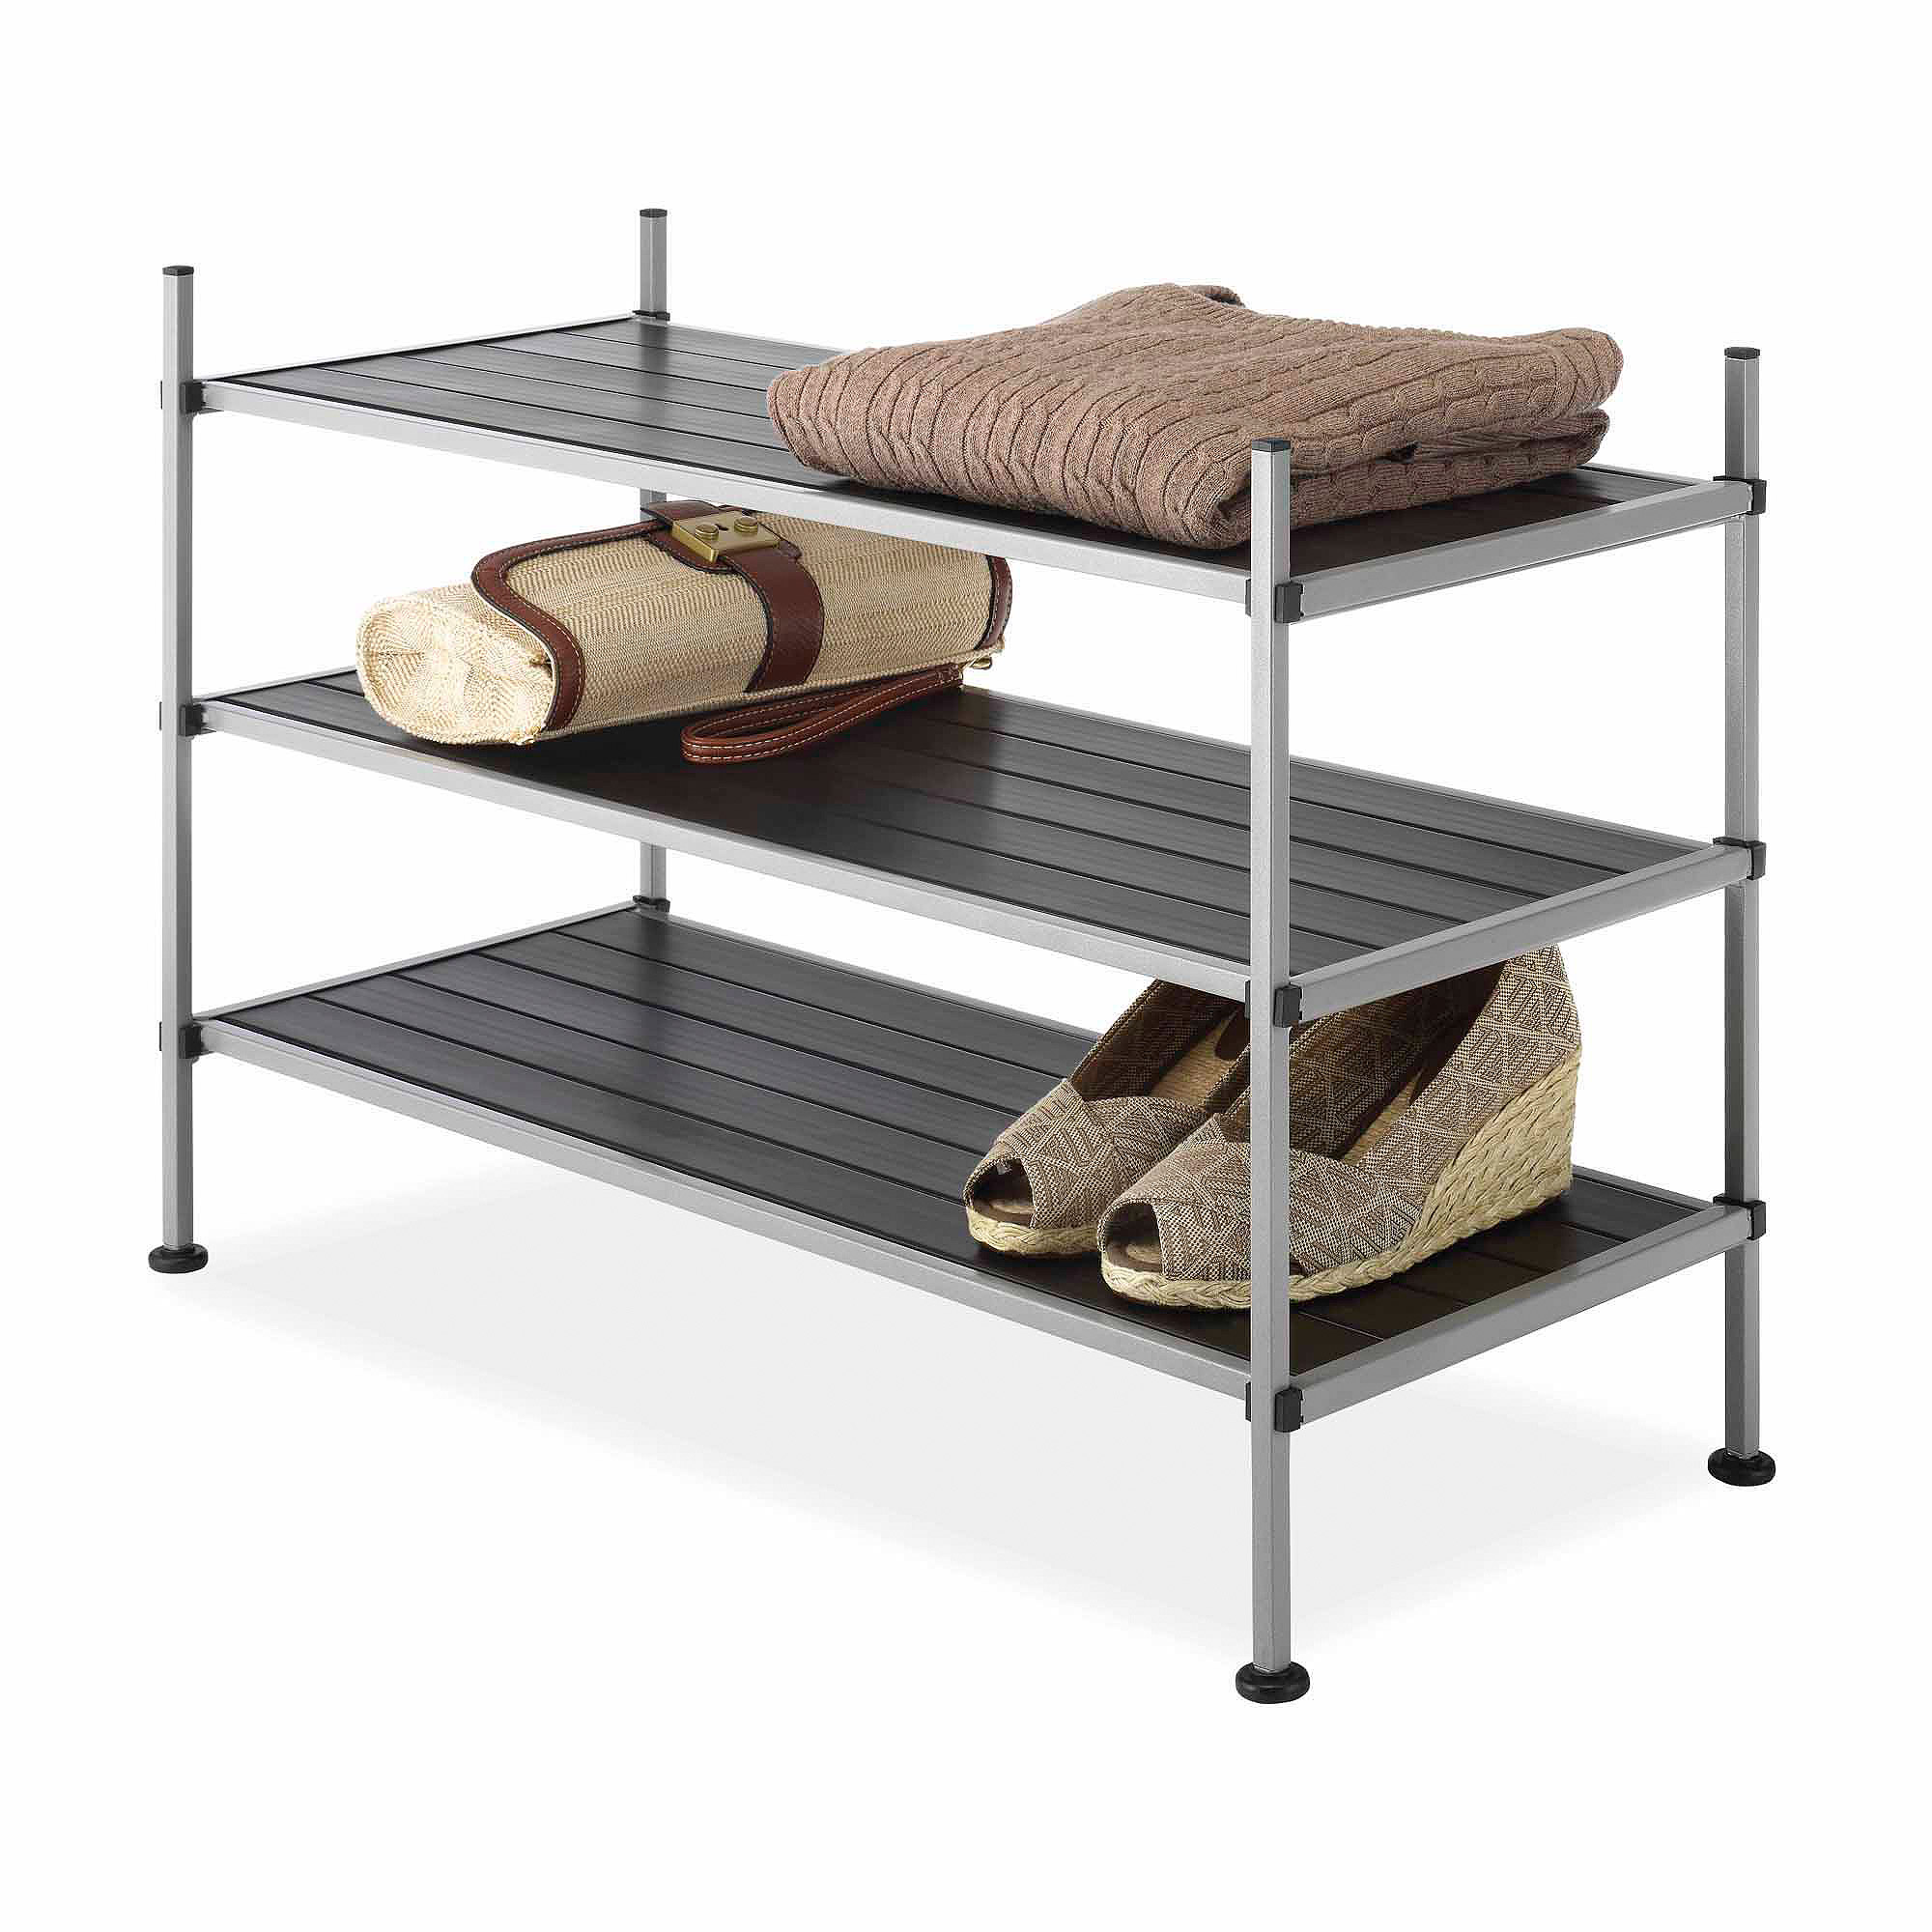 Whitmor 3-Tier Storage Shelves by Whitmor Inc